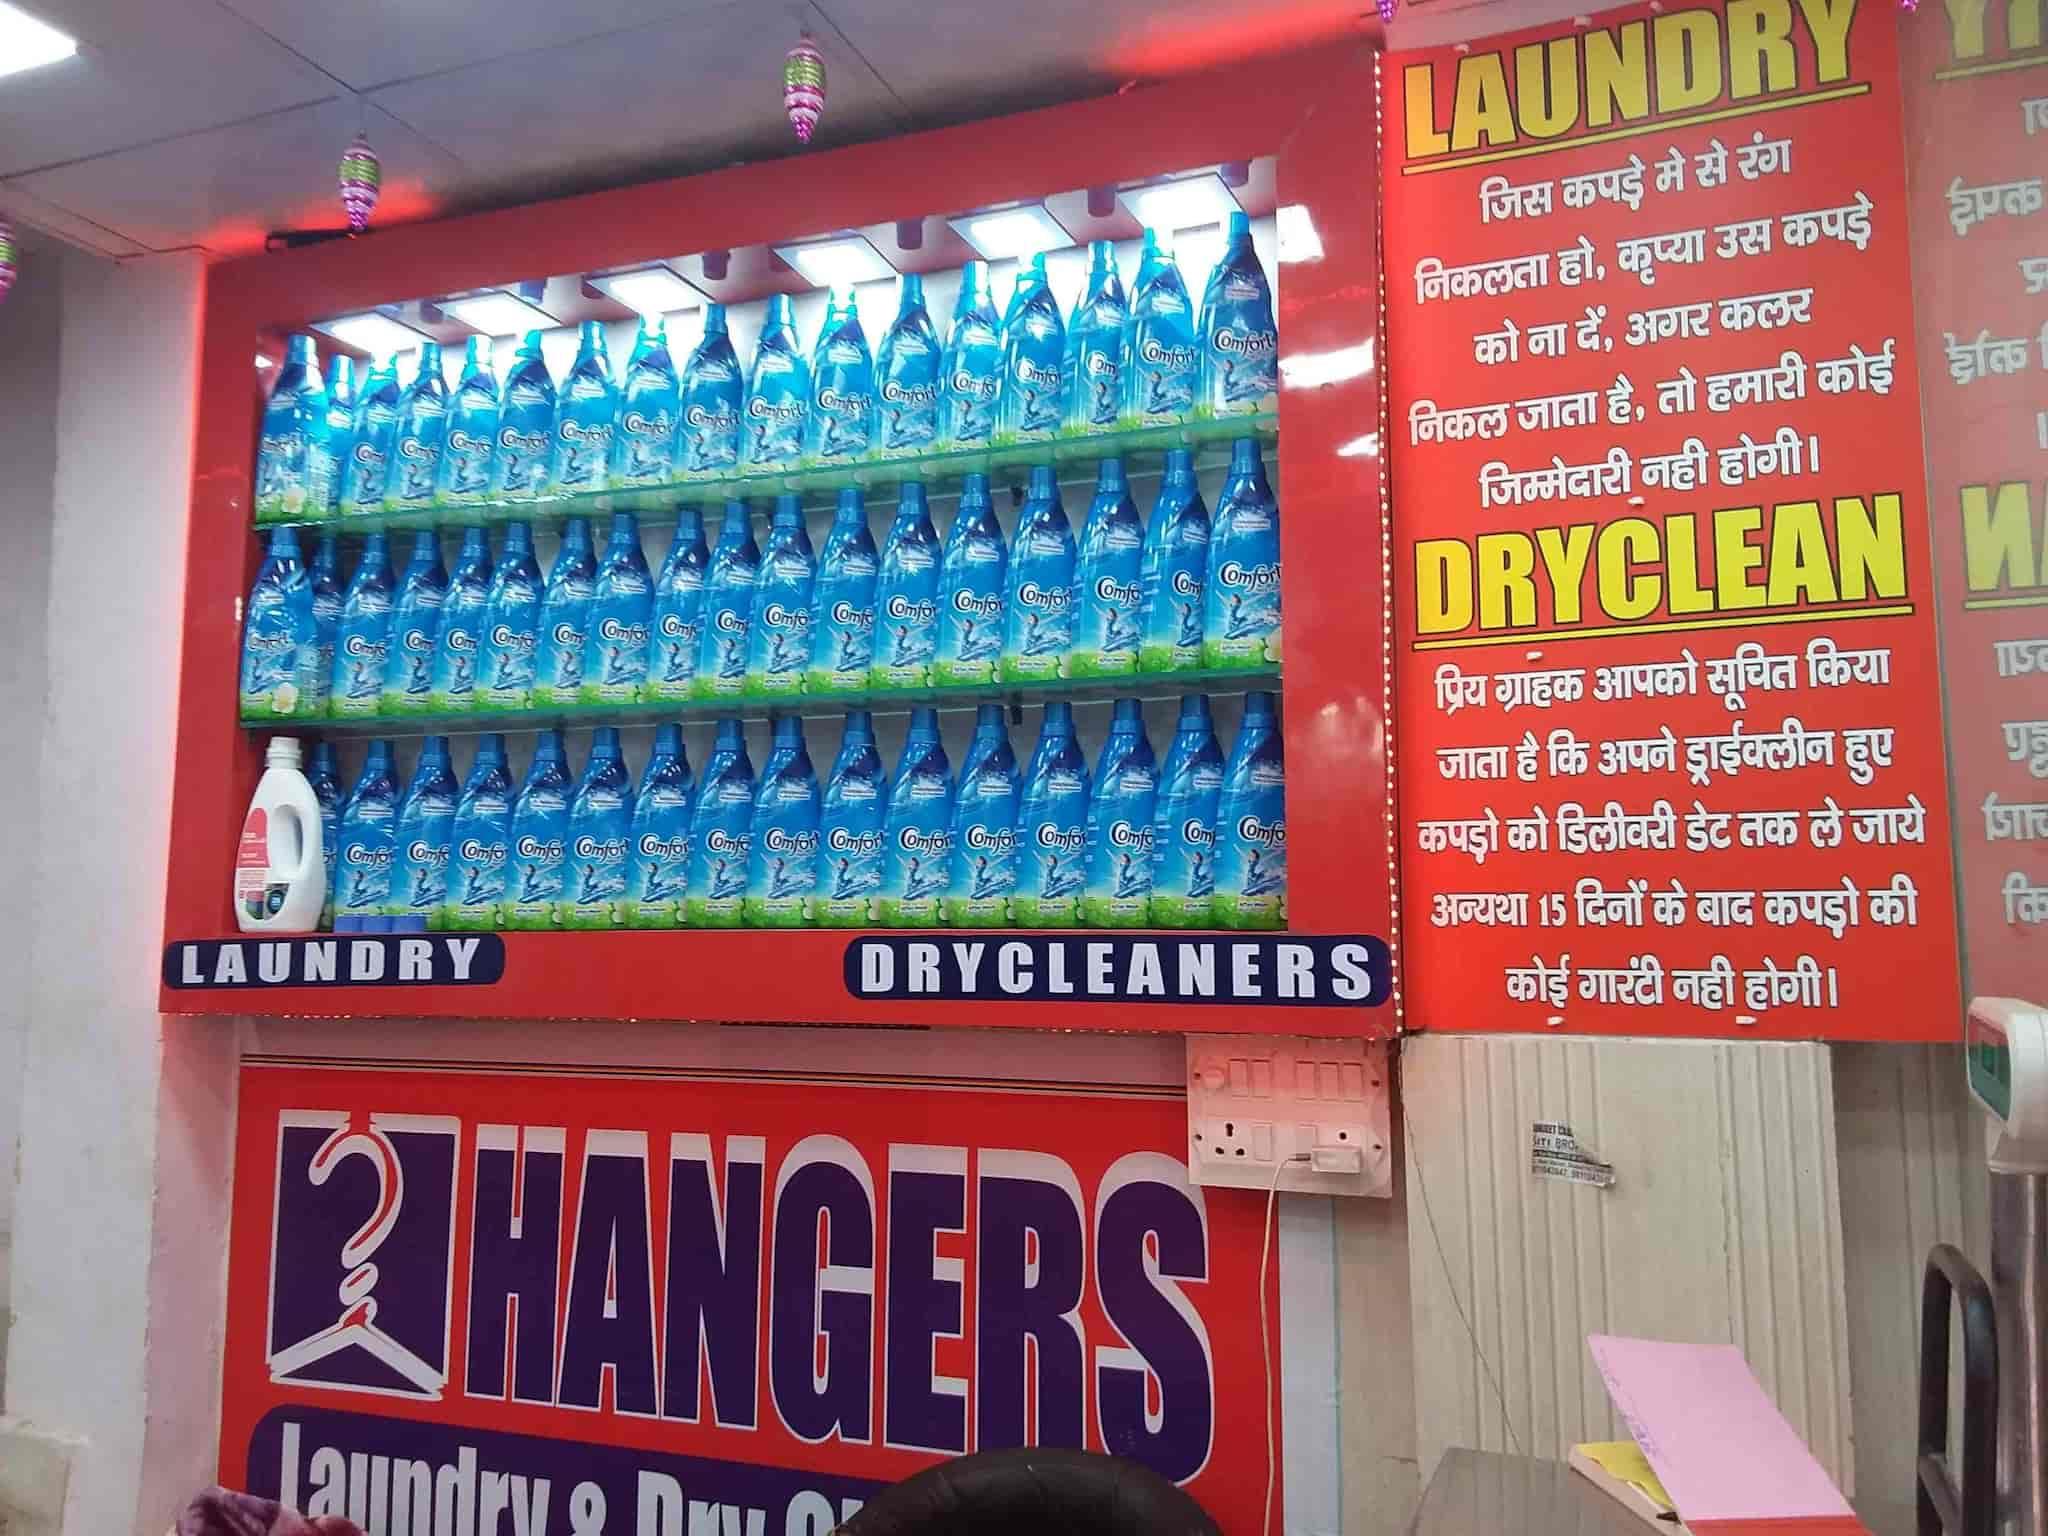 Hangers Laundry Dry Cleaners Photos, Laxmi Nagar, Delhi- Pictures ...